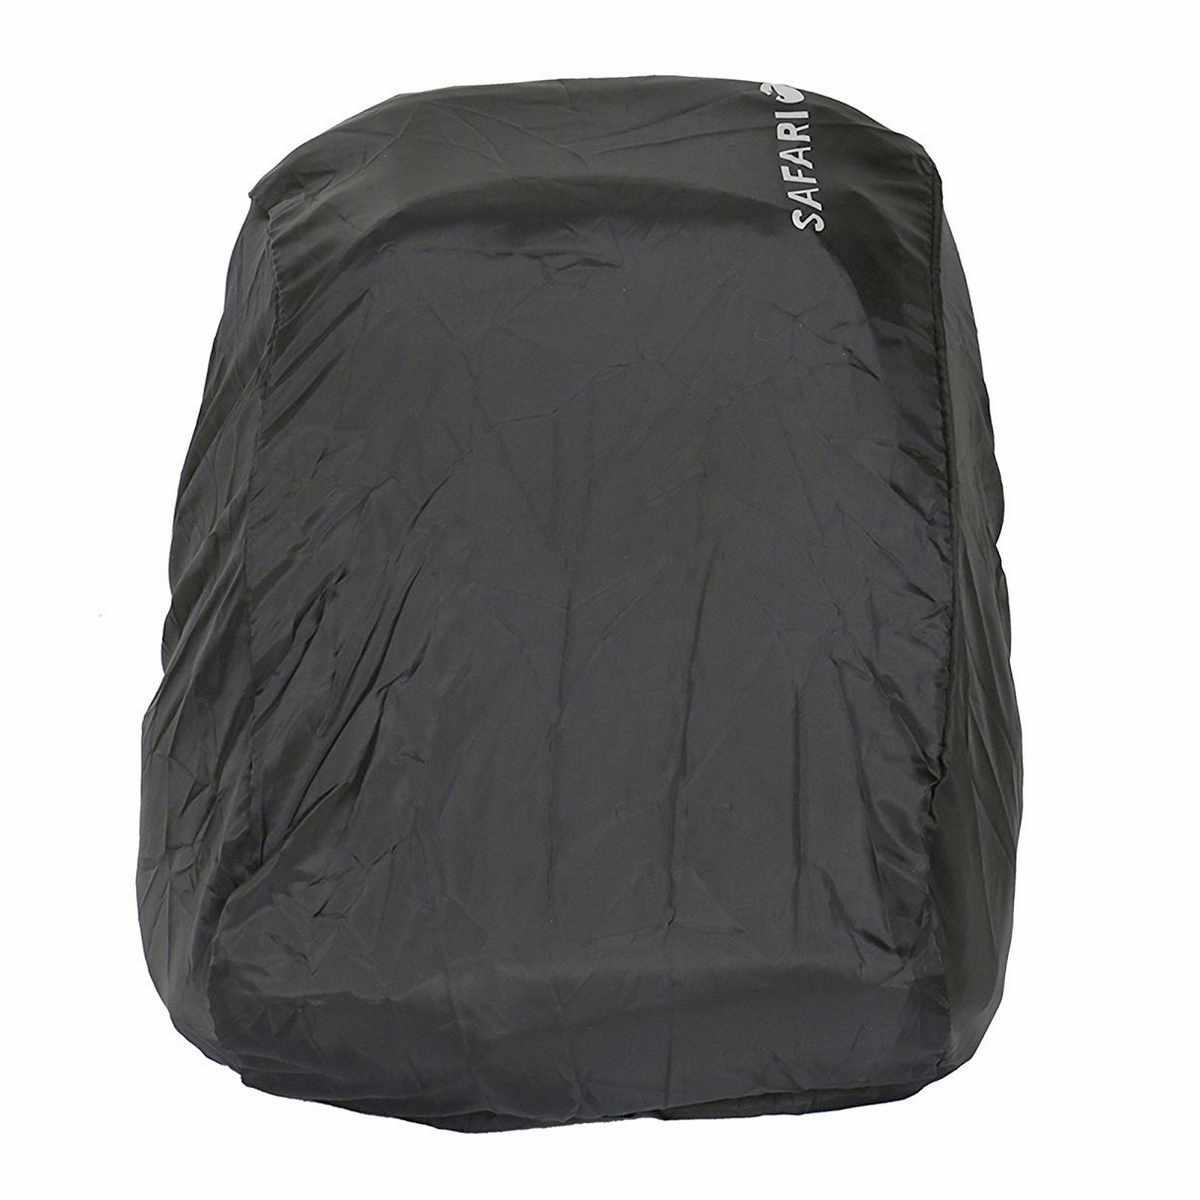 6a656c9ba3 Safari Trance Laptop Backpack Bag-Sunrise Trading Co.